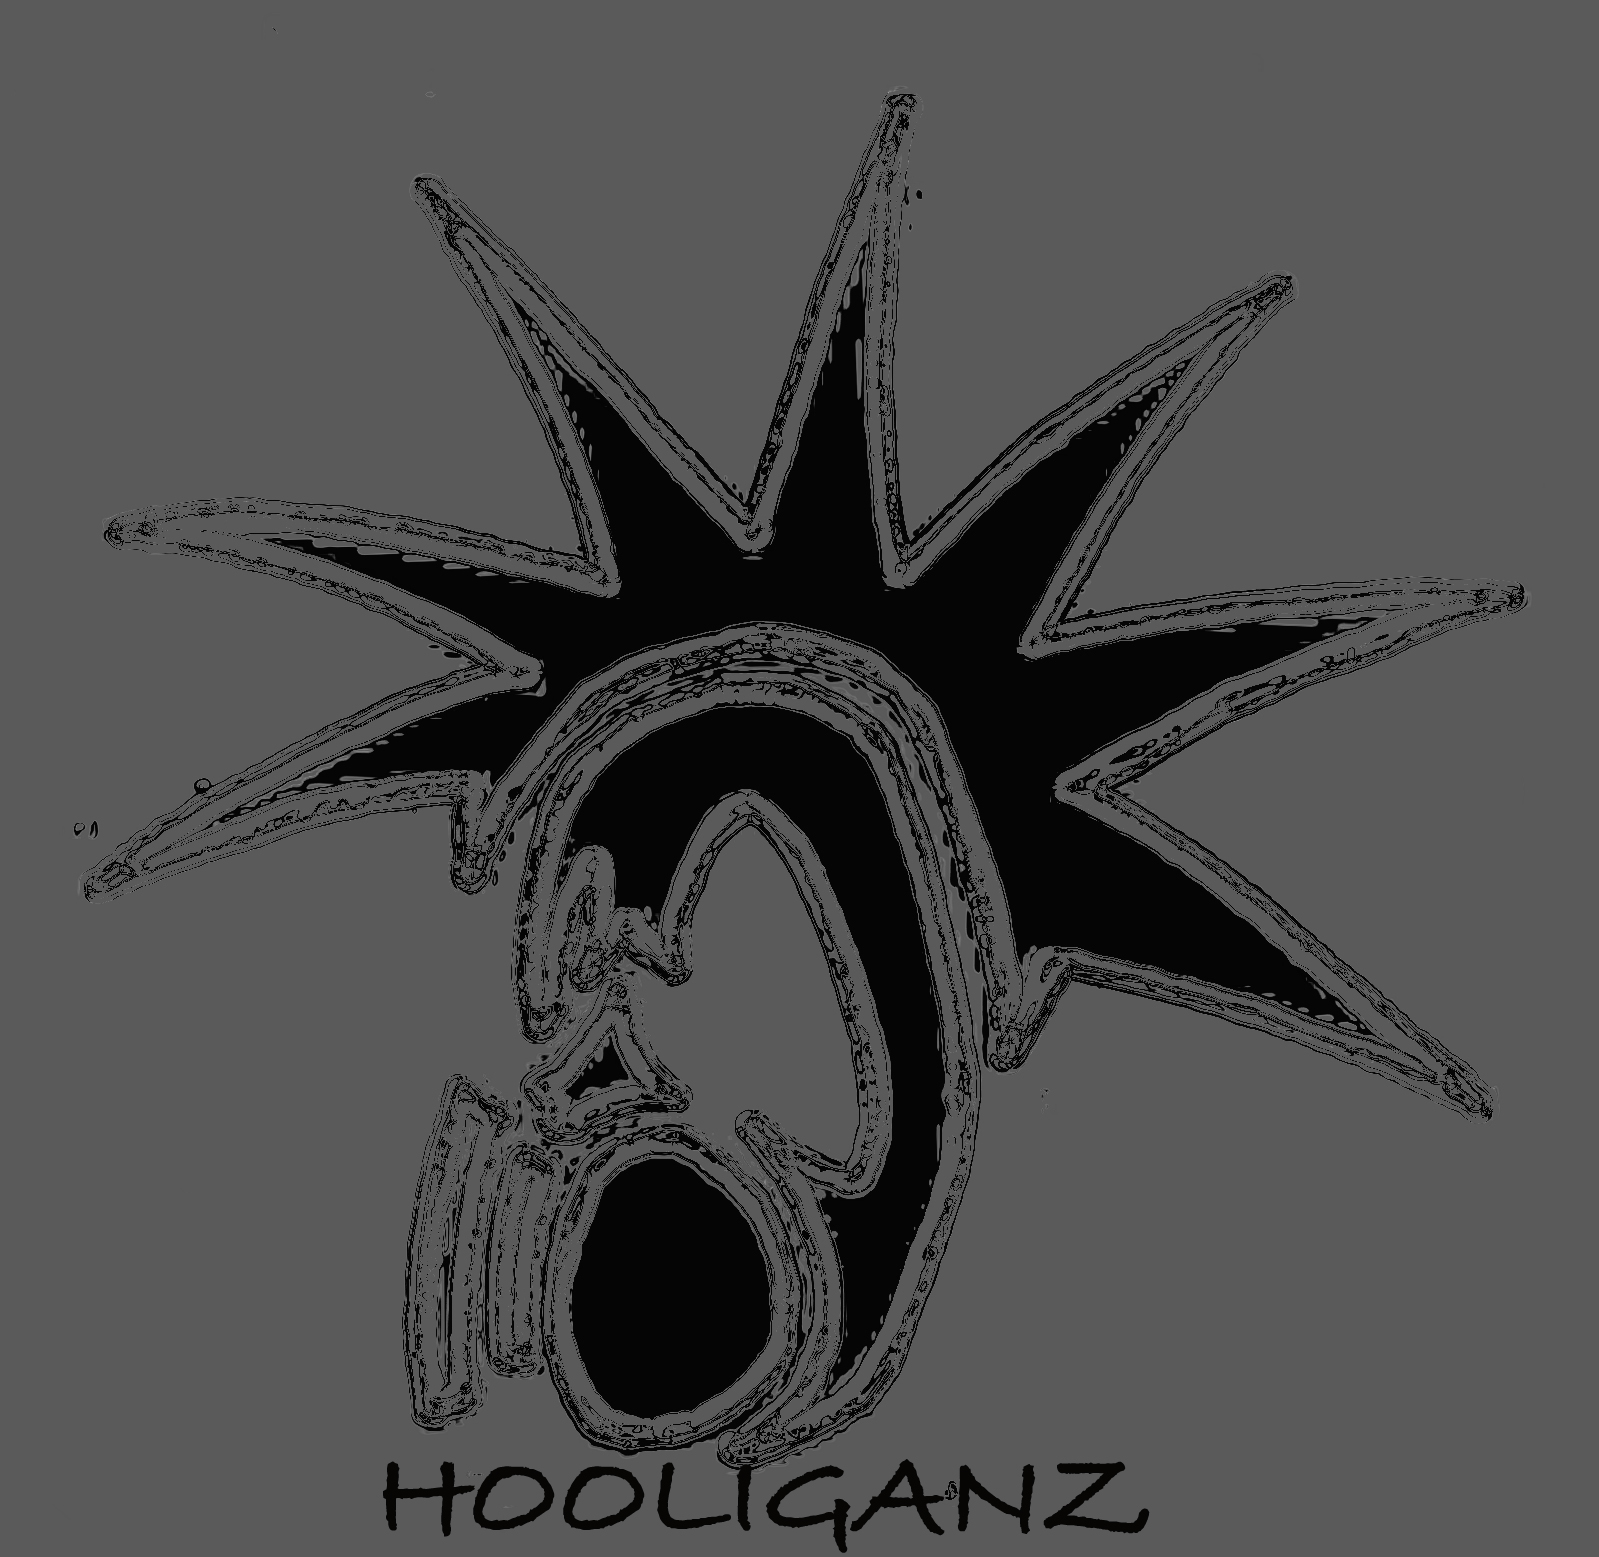 Click image for larger version  Name:hooliganz_mask_liquid_02.jpg Views:87 Size:480.1 KB ID:2600